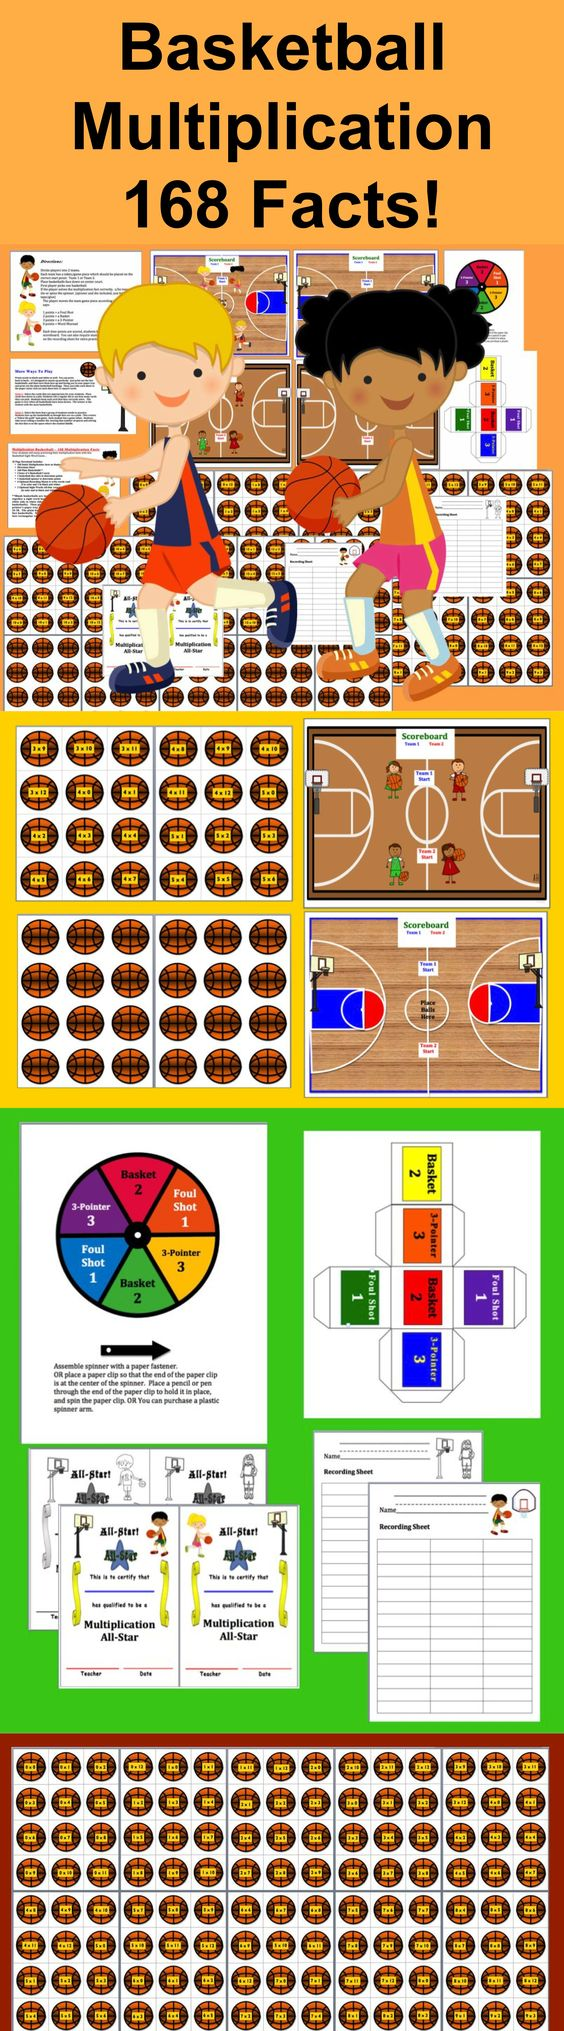 Worksheet Basketball Multiplication basketball multiplication scalien math centers 3 ways to play 168